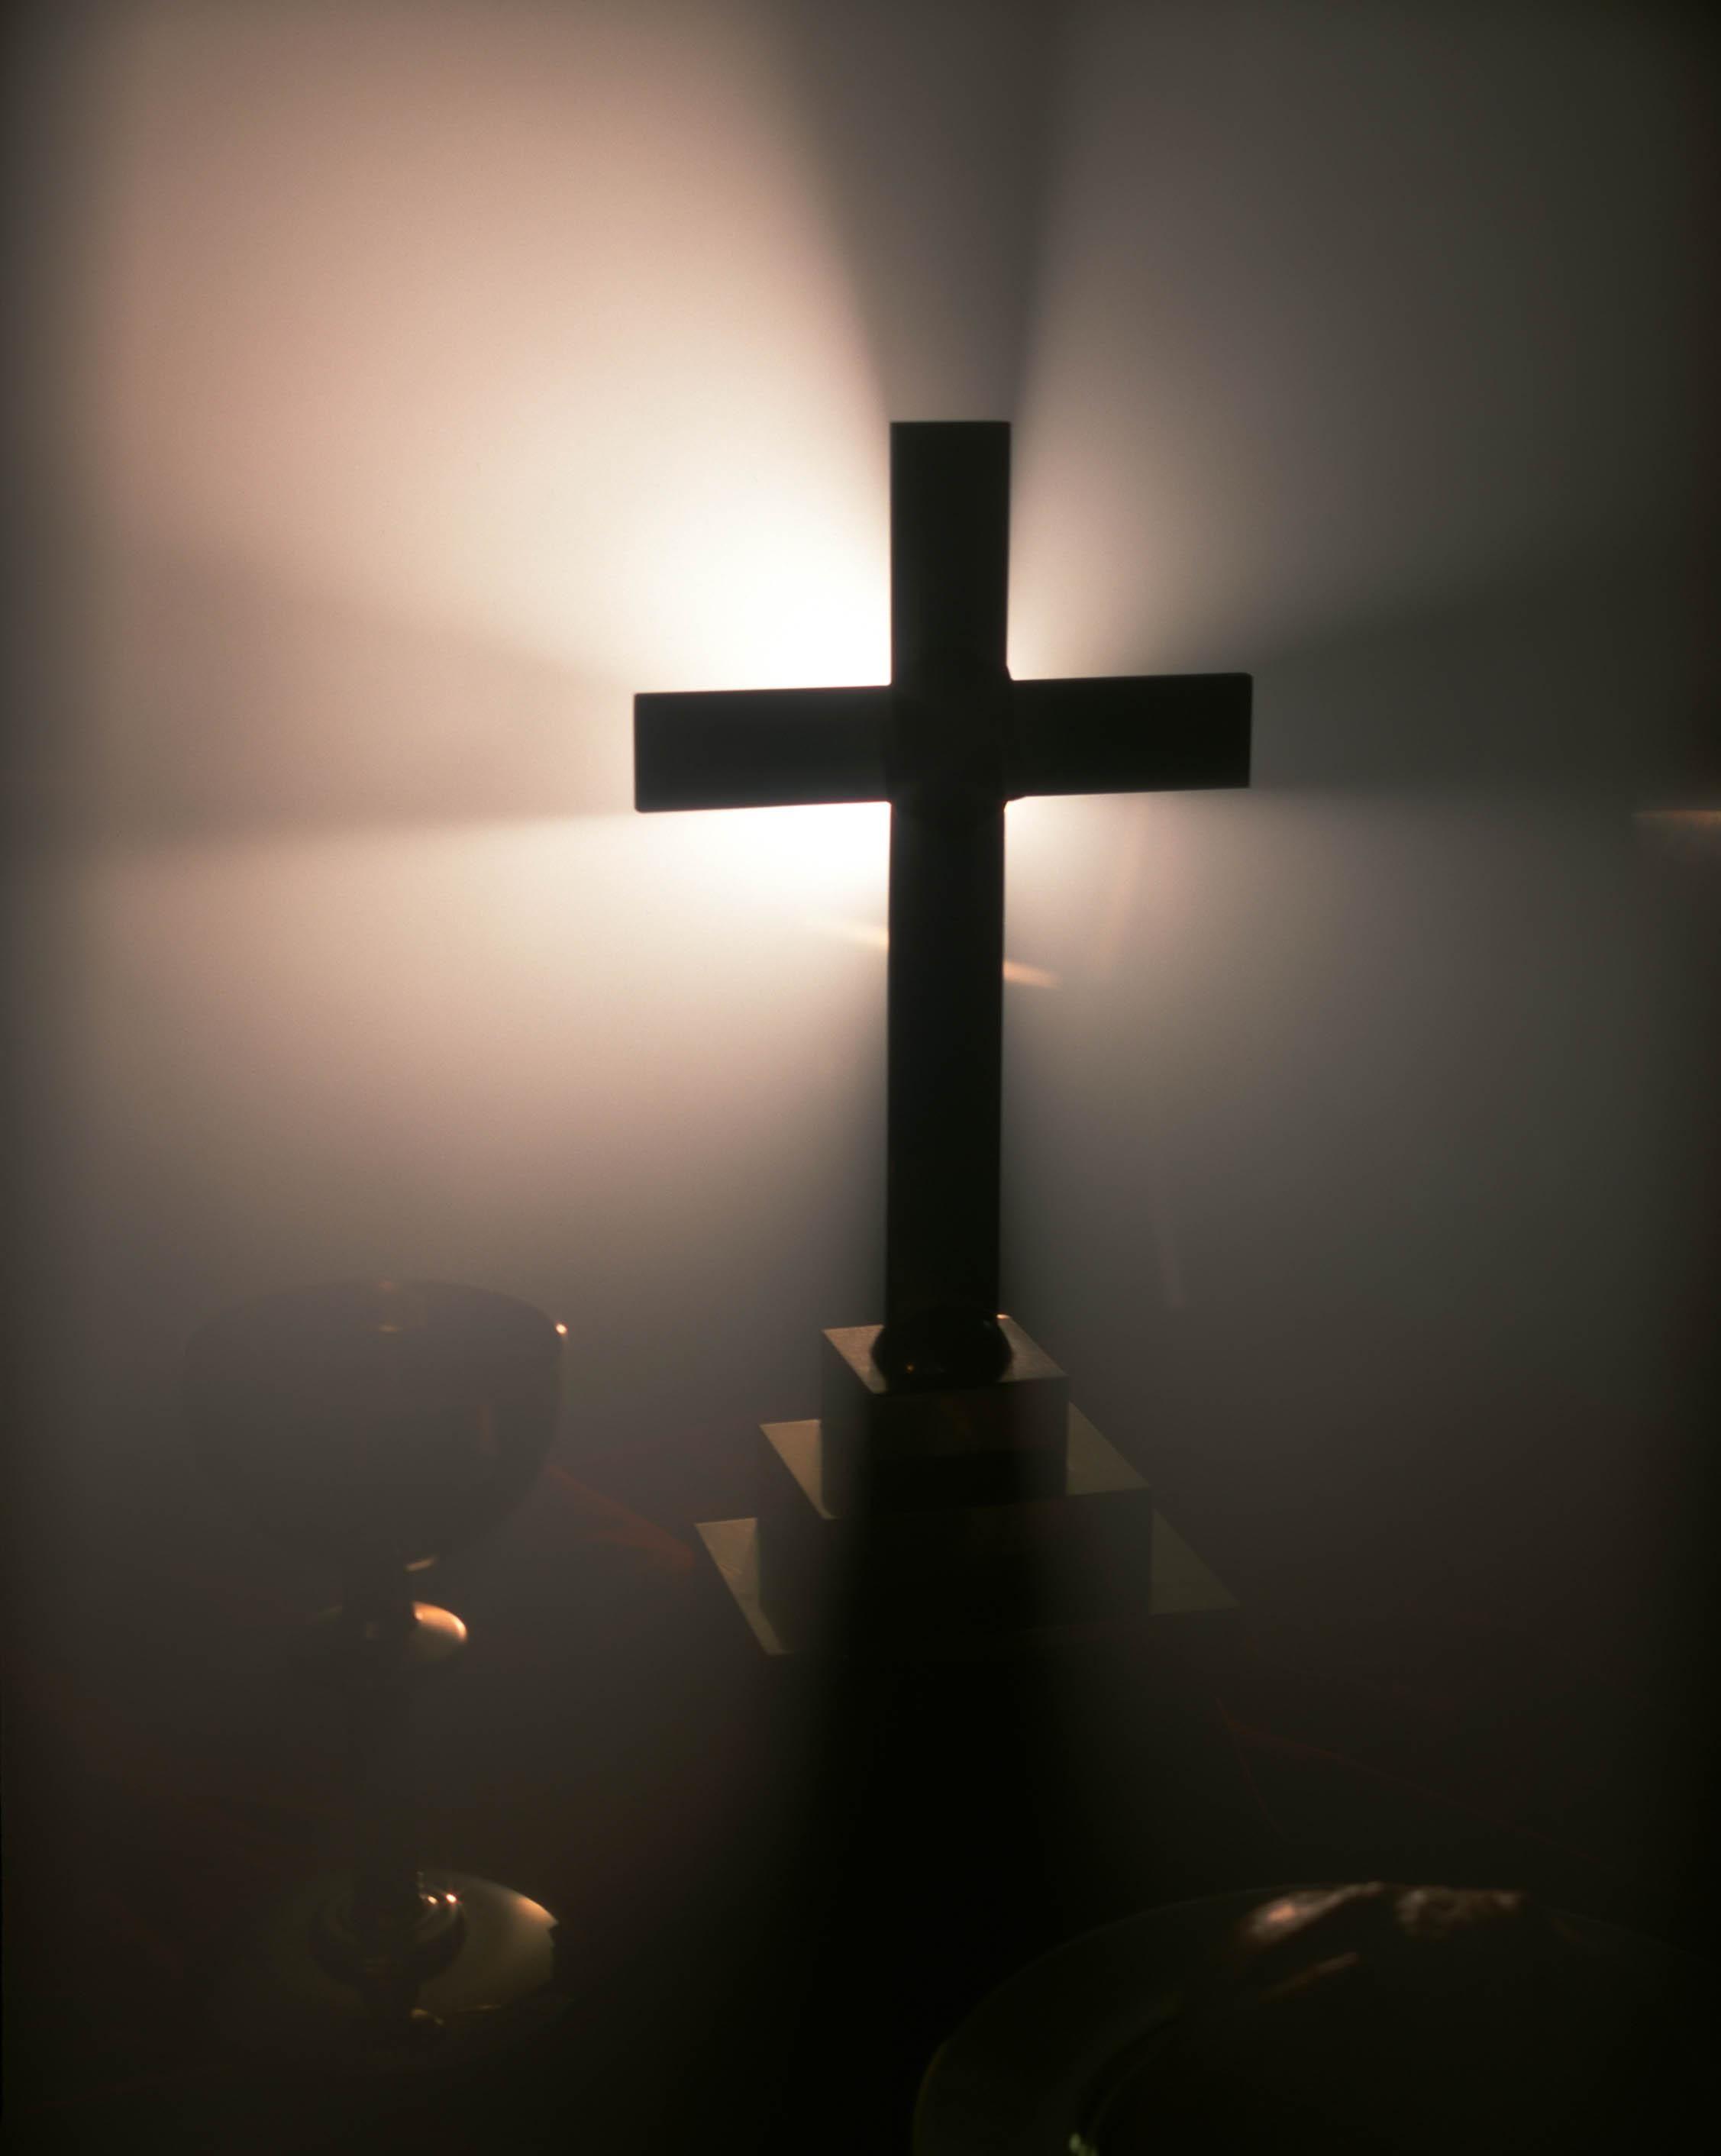 http://www.turnbacktogod.com/wp-content/uploads/2008/07/jesus-calvary-cross-0504.jpg  | Cross pictures, Jesus on the cross, Jesus pictures